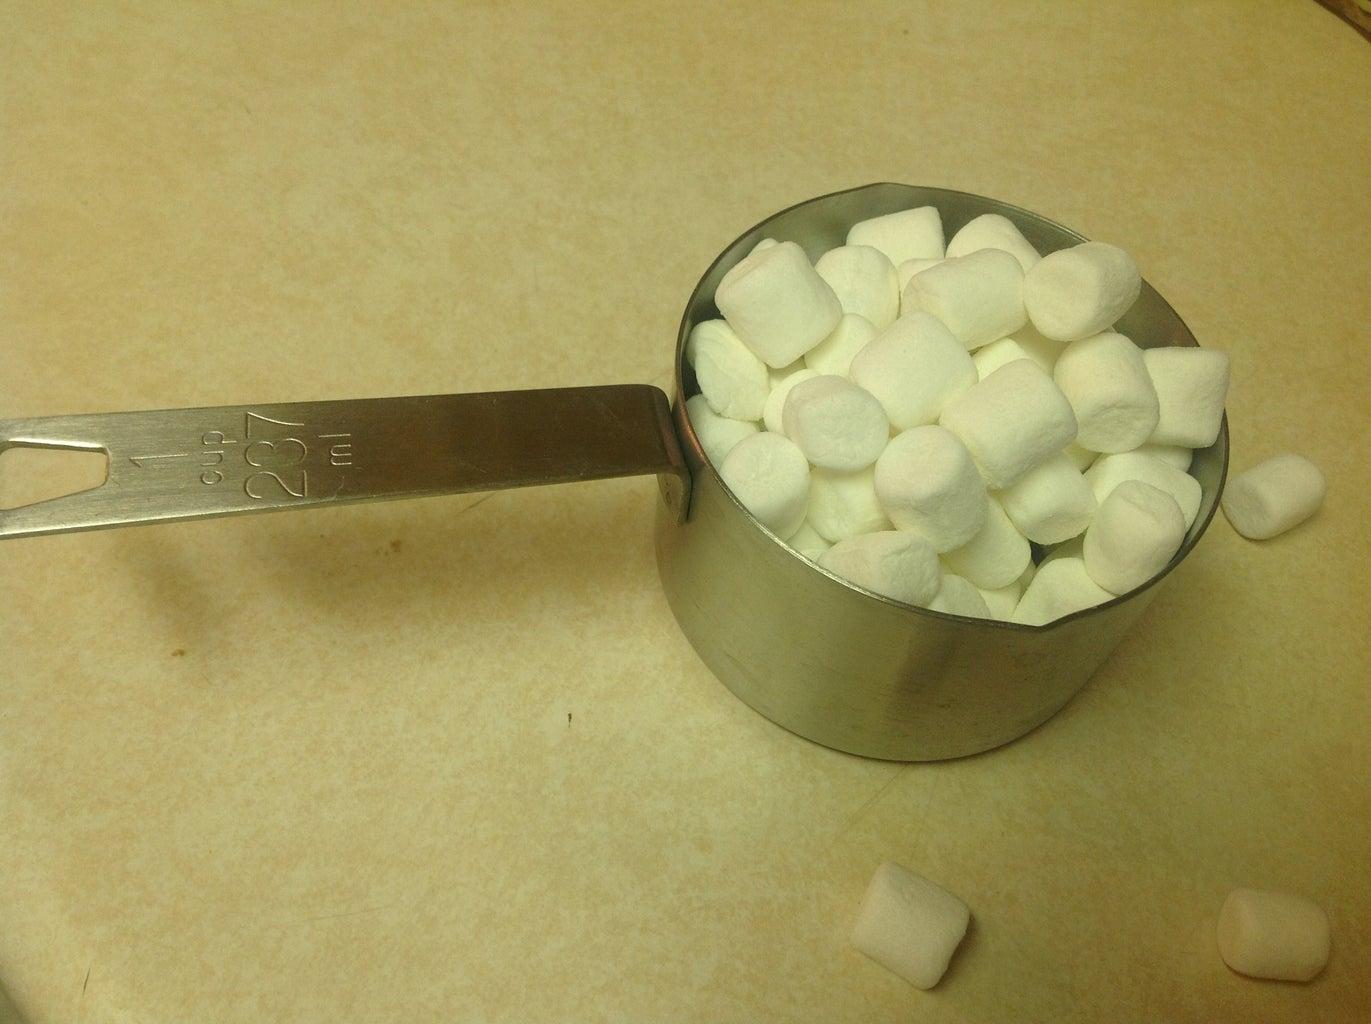 Melt the Marshmallows